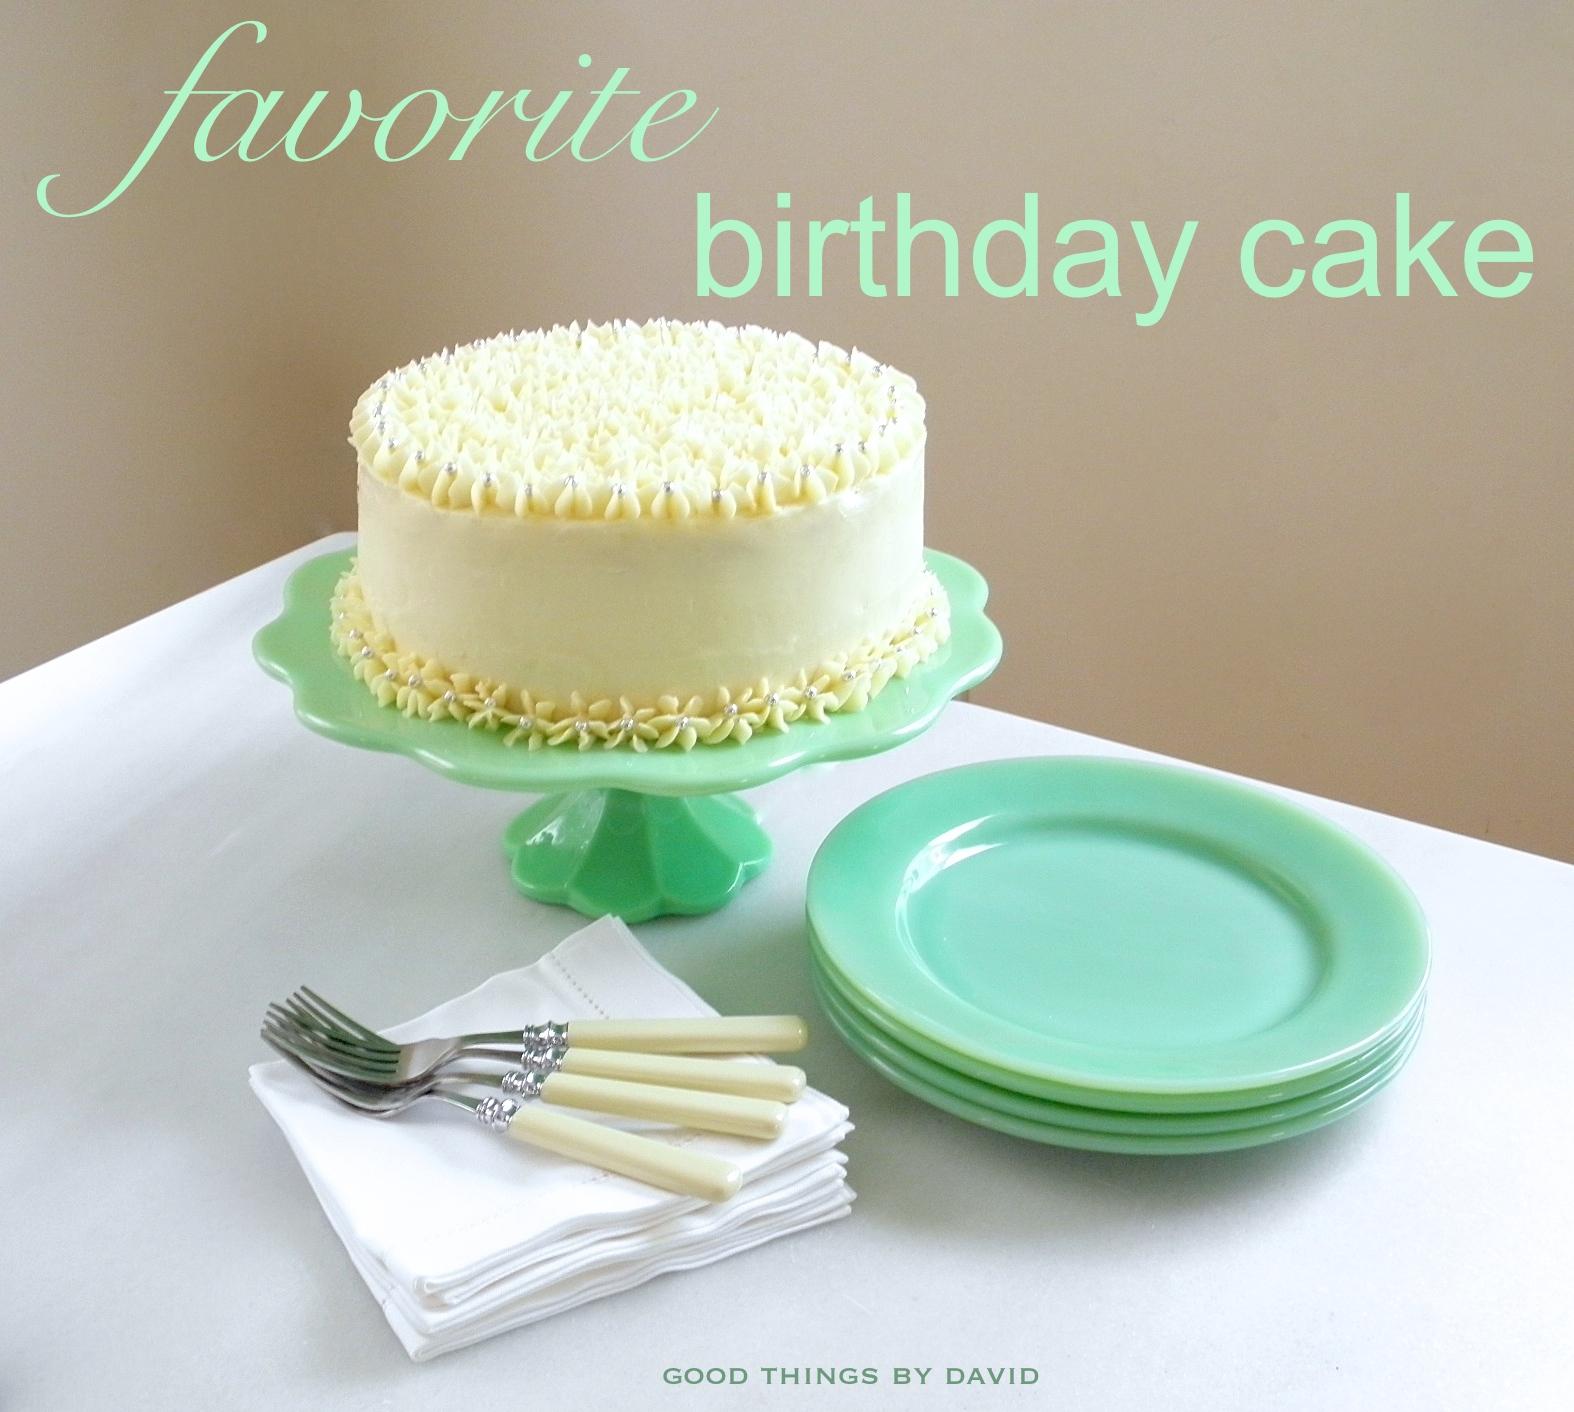 Good Things By David Favorite Birthday Cake - Favorite birthday cake